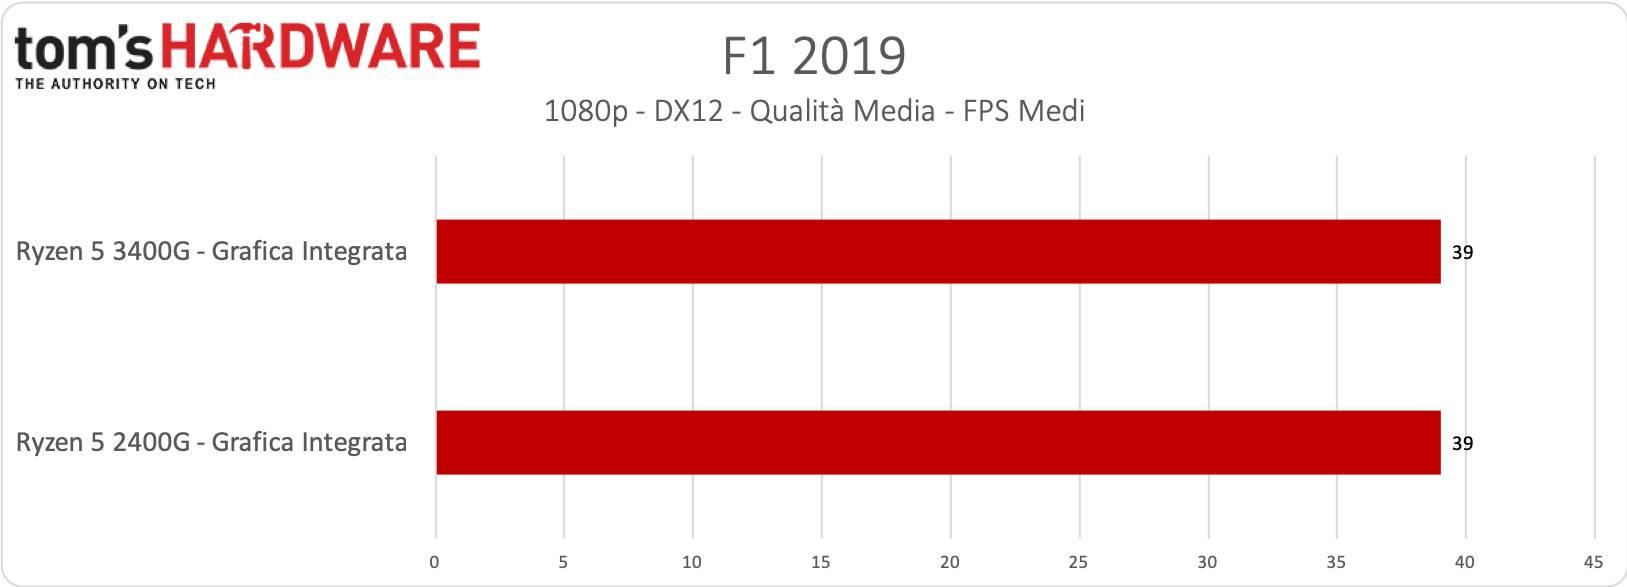 Ryzen 5 3400 - Grafica Integrata - F1 2019